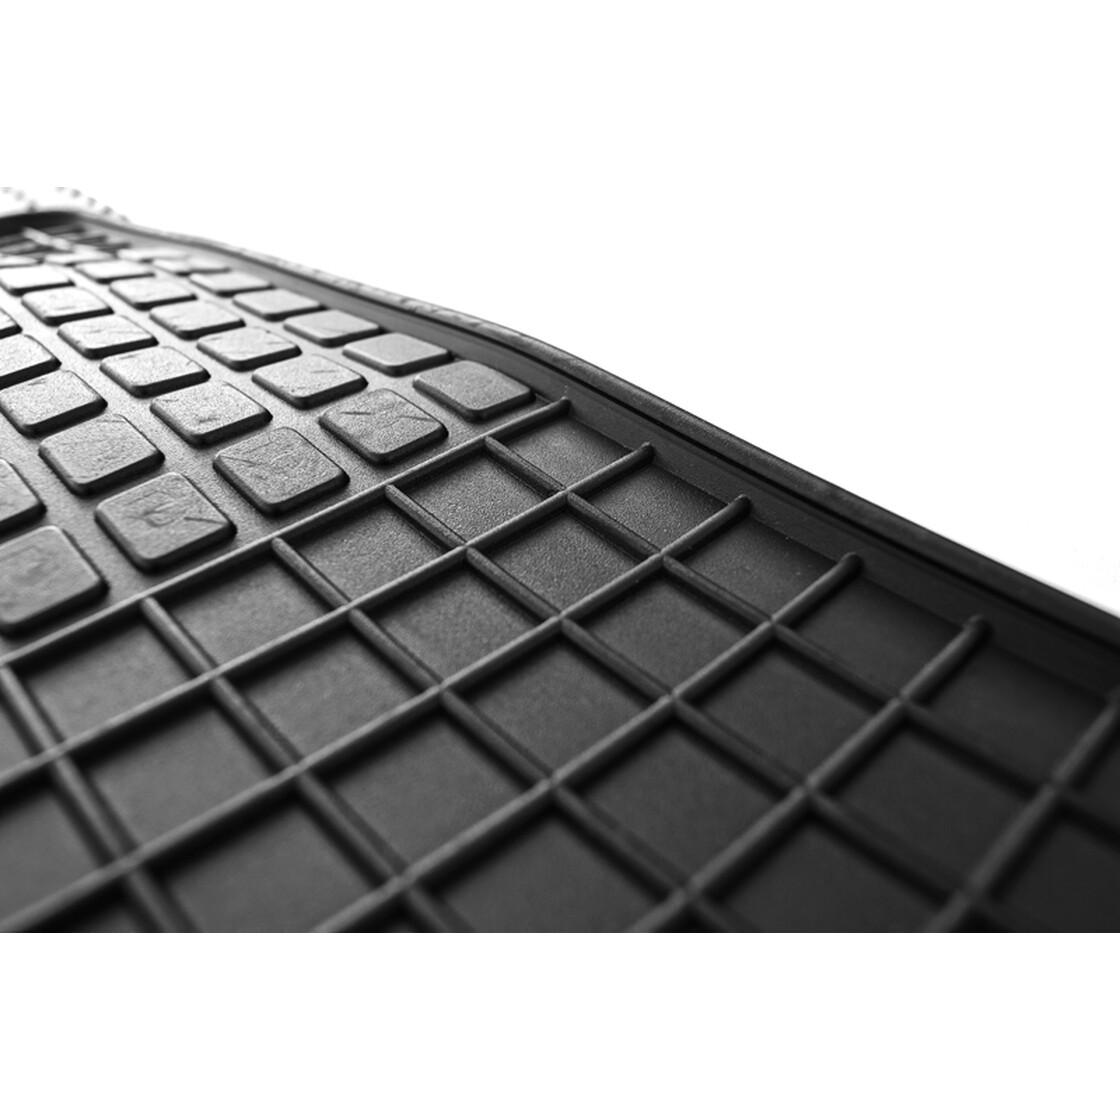 audi q5 sq5 gummi fu matten original kaufen. Black Bedroom Furniture Sets. Home Design Ideas